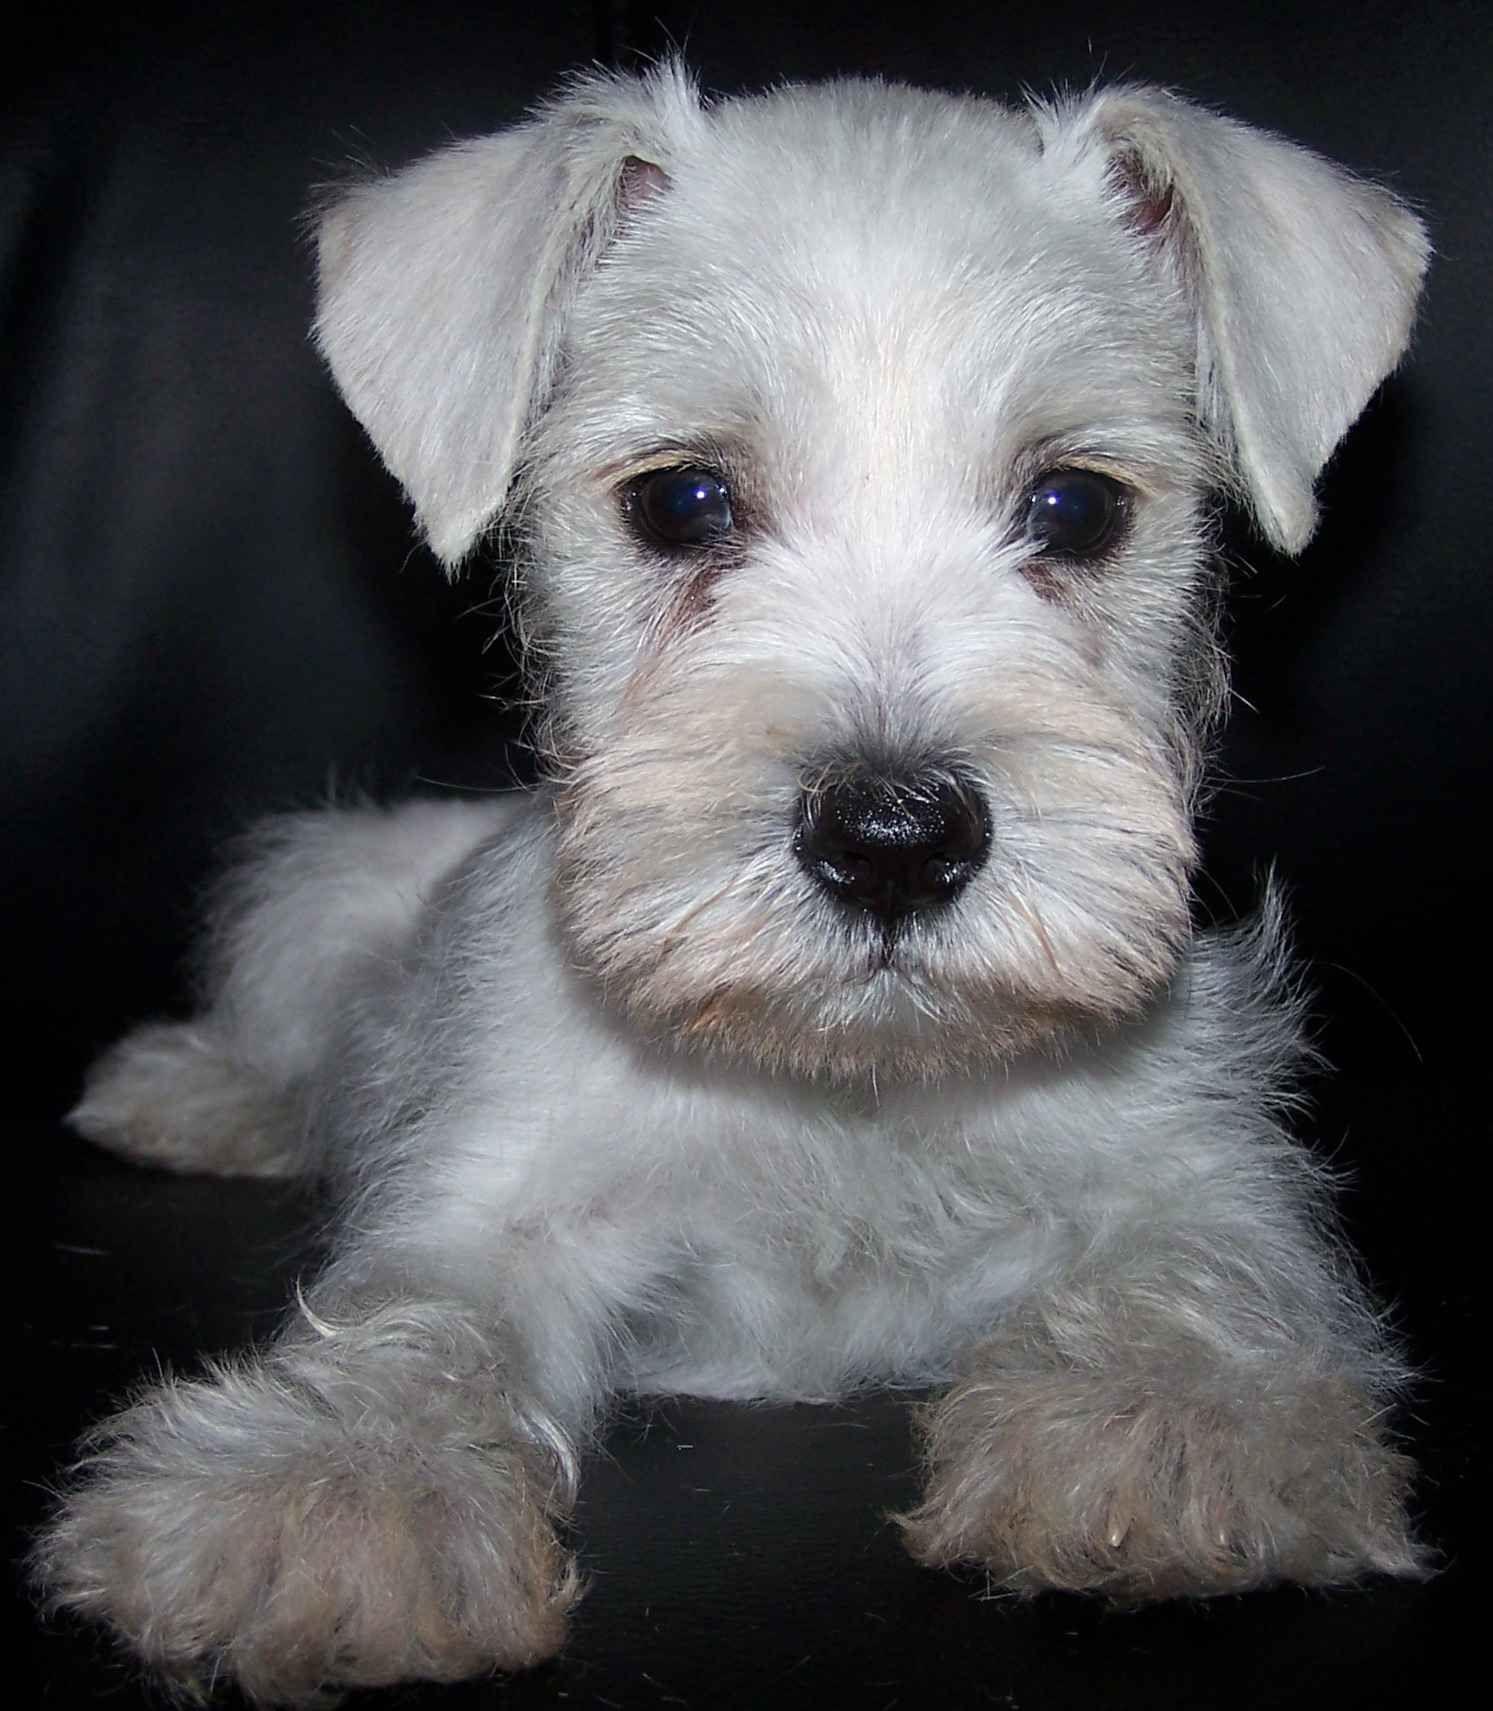 Cute Puppy Dogs White Miniature Schnauzer Puppies Schnauzer Puppy White Miniature Schnauzer White Schnauzer